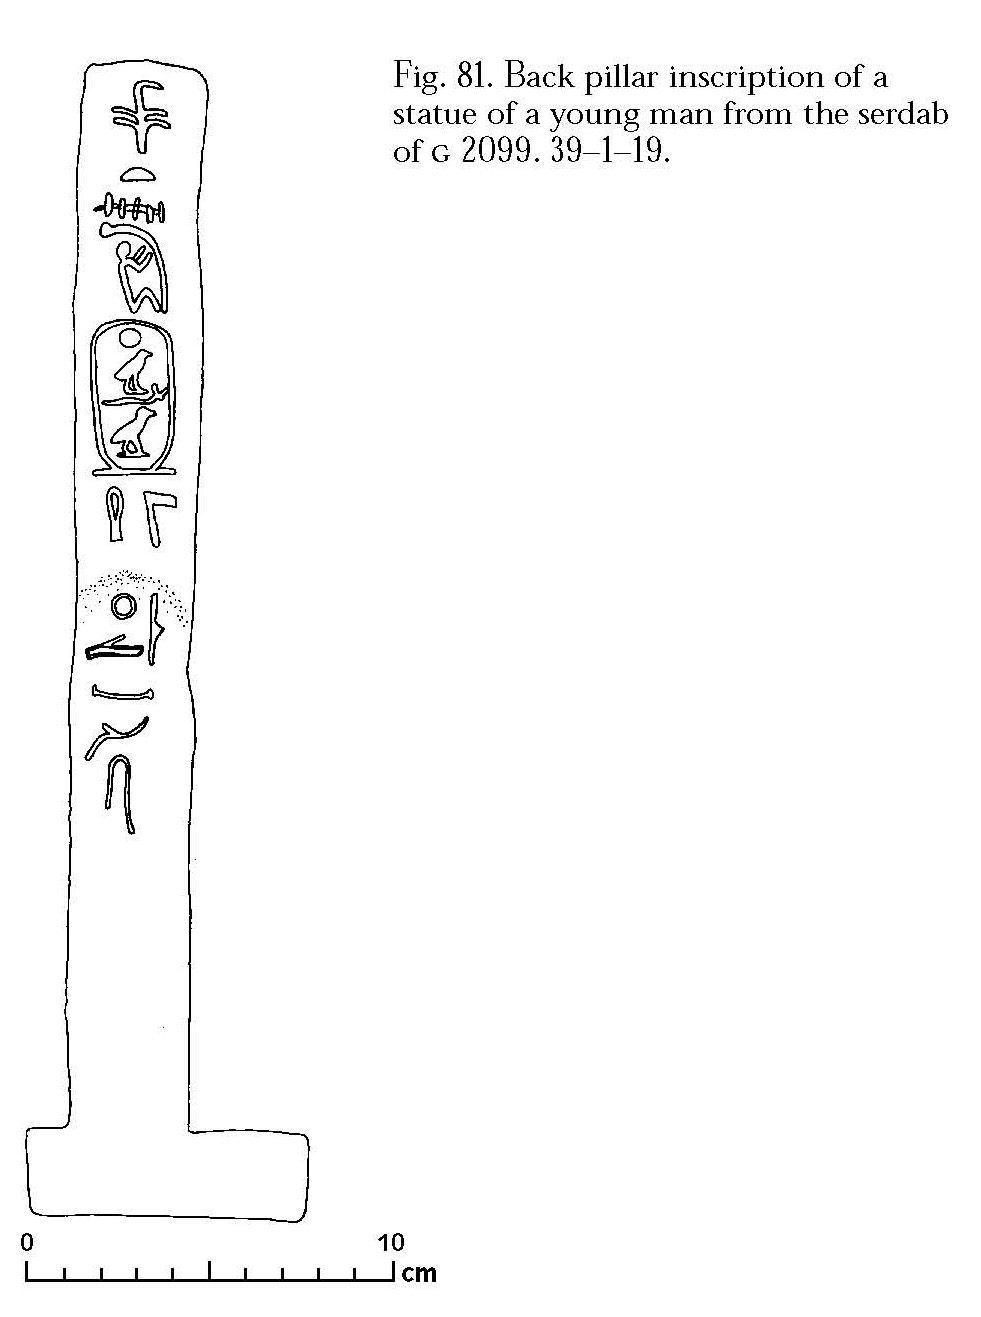 Drawings: G 2099: inscription from statue, back pillar